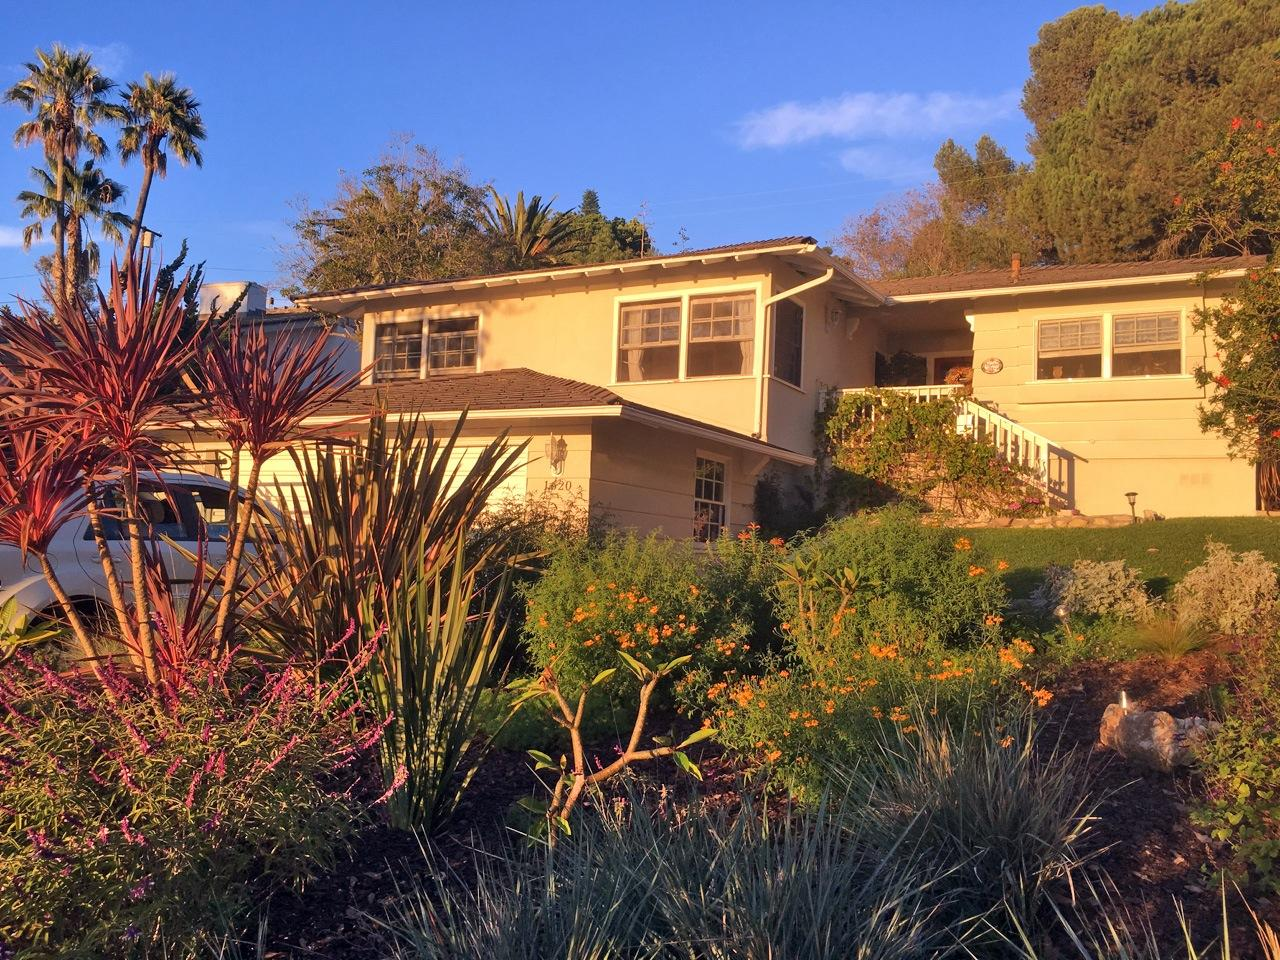 1620 Espinosa Cir, Palos Verdes Estates, CA 90274 For Rent   Trulia